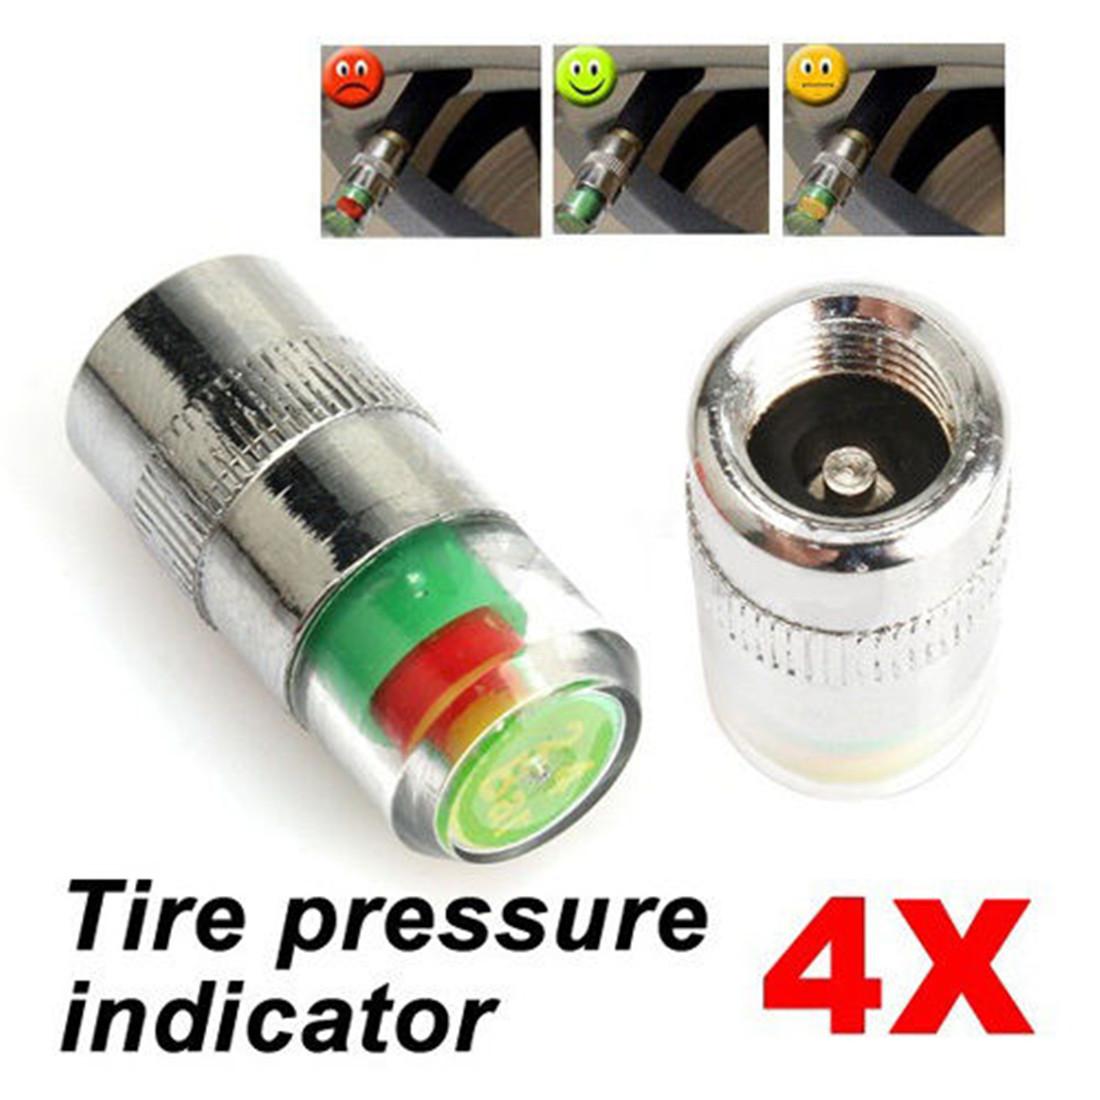 4 auto car tire type air pressure alert indicator valve stem monitor sensor cap ebay. Black Bedroom Furniture Sets. Home Design Ideas